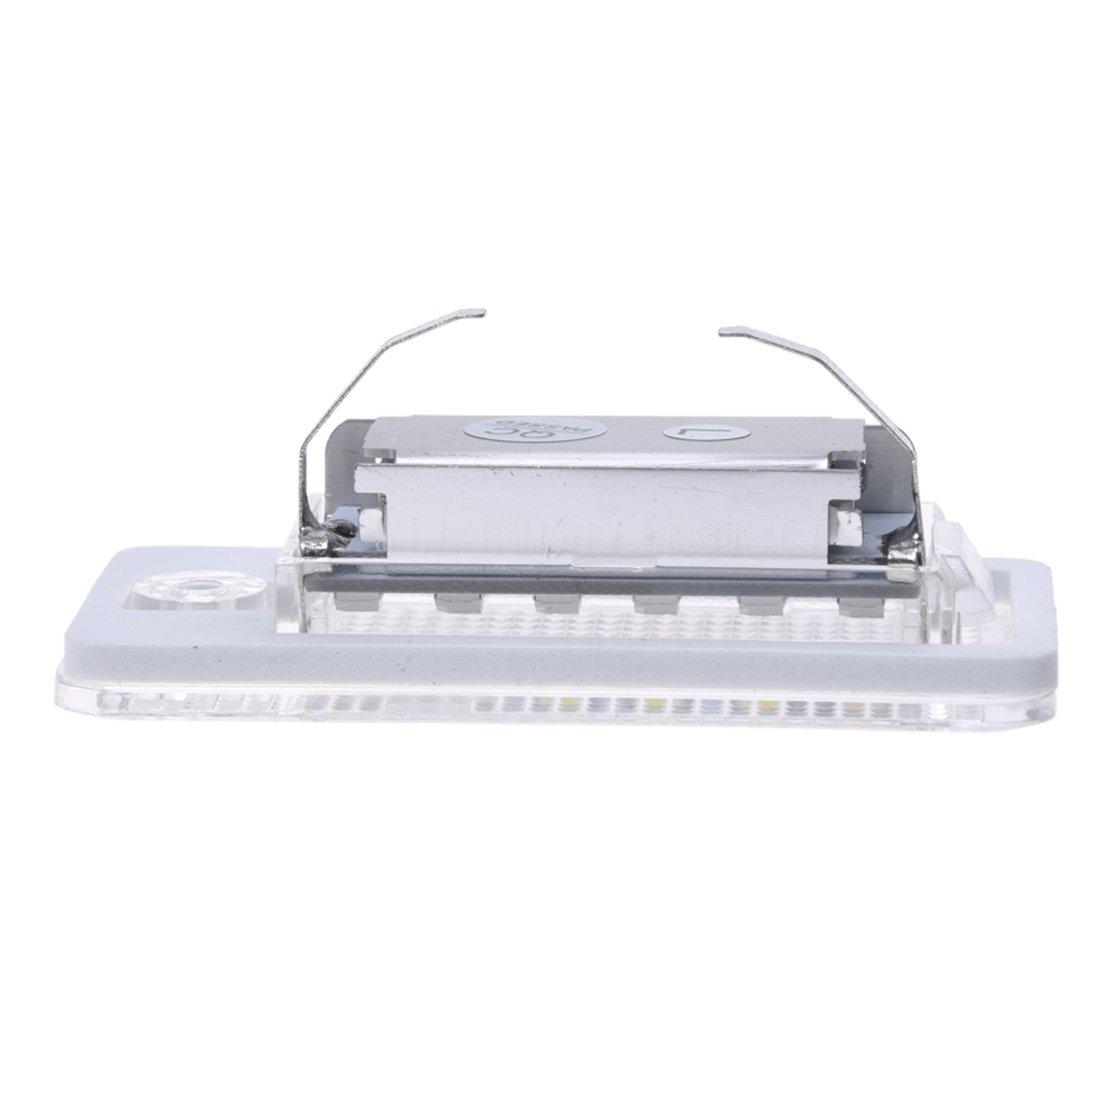 JVSISM 2 Blanco 18 SMD LED Bombilla de Placa de matricula para A3 A4 8E RS4 A6 RS6